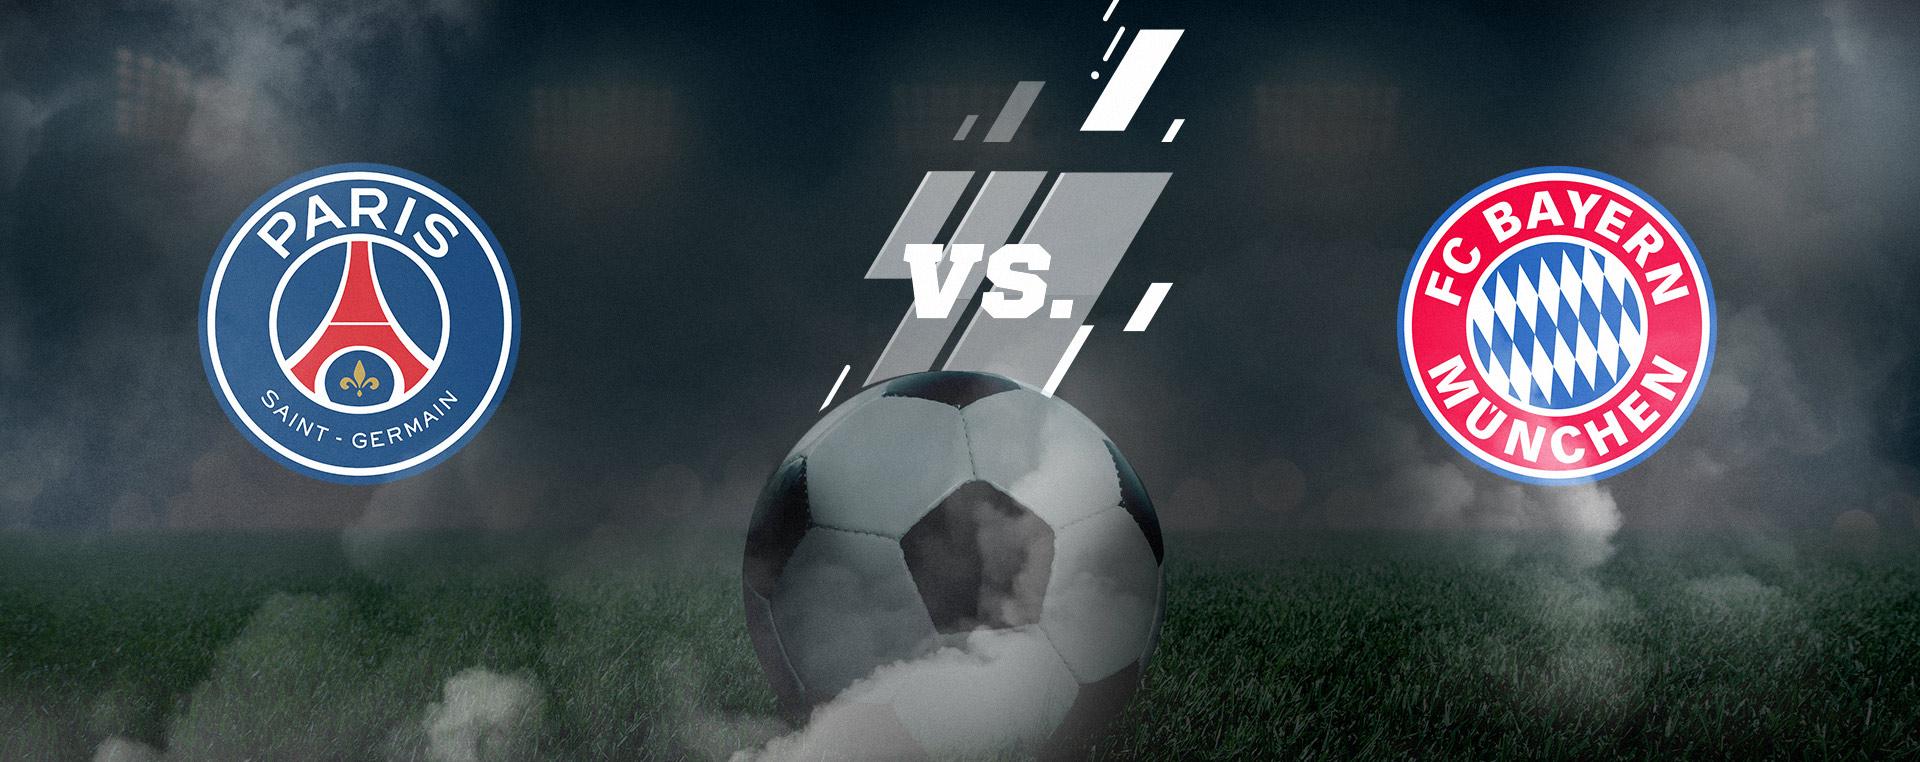 PSG VS BAYERN MUNICH: BETTING PREVIEW